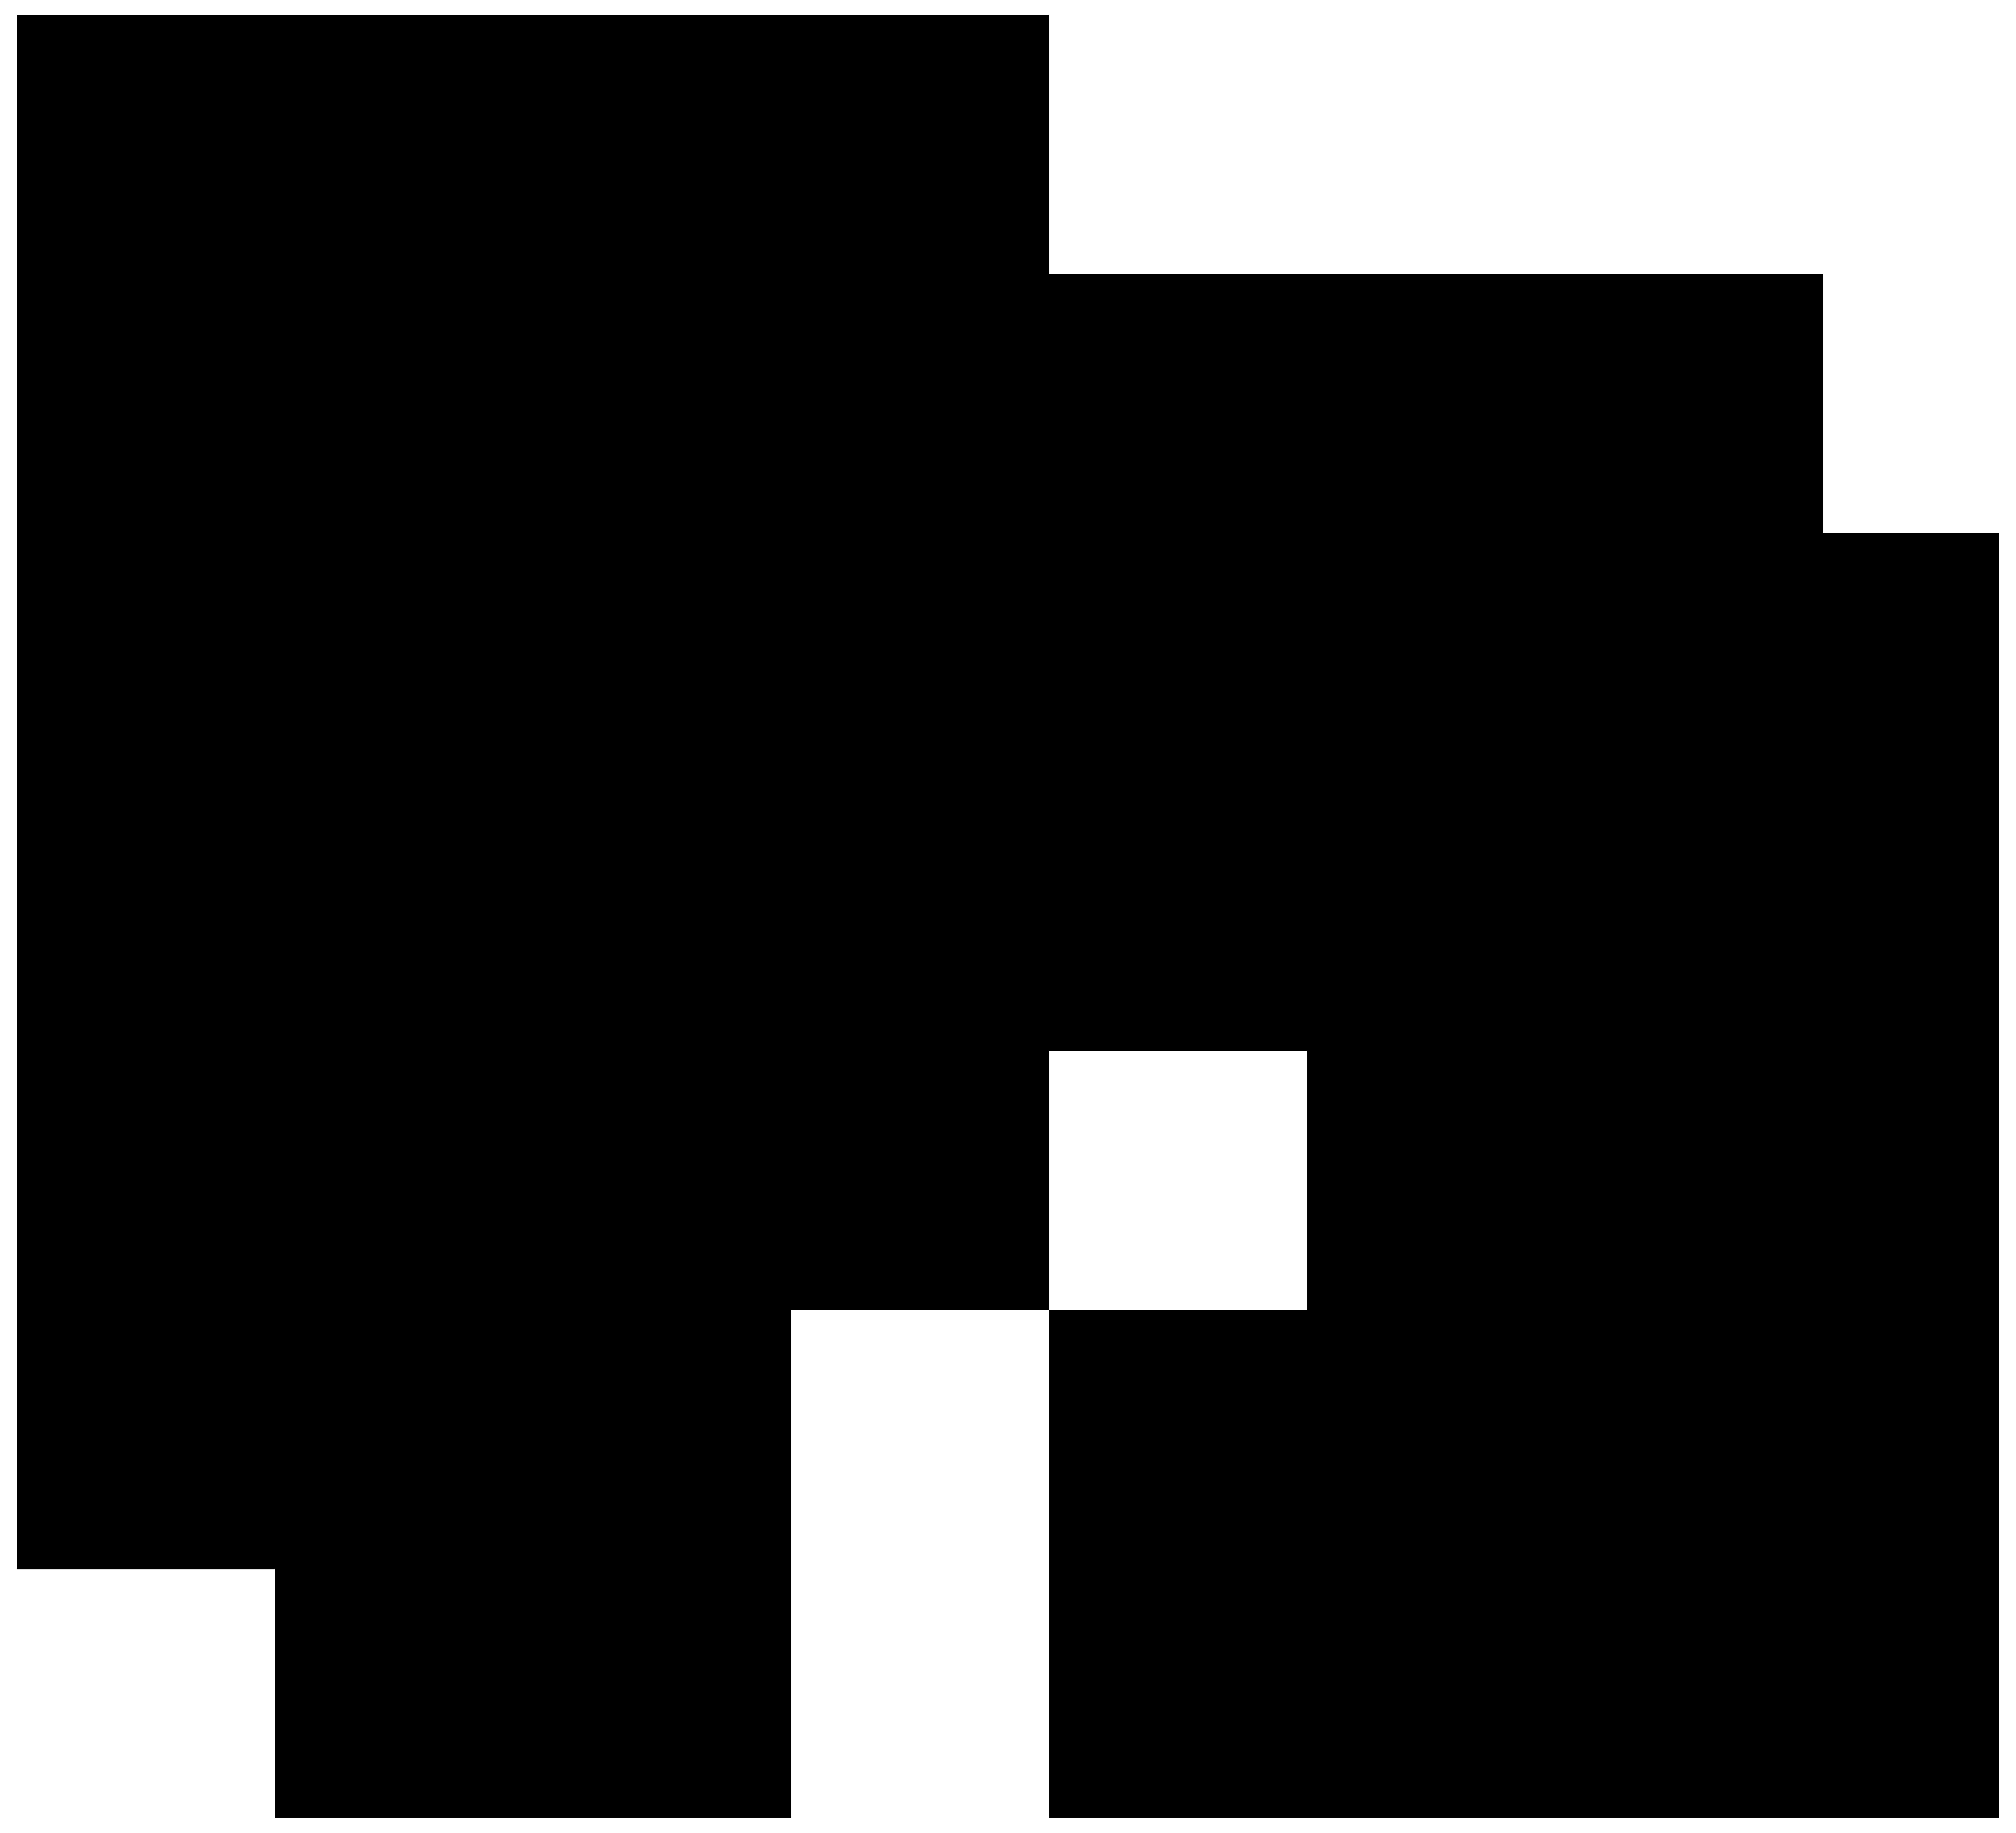 Clip art silhouette transparent. Horse clipart mare